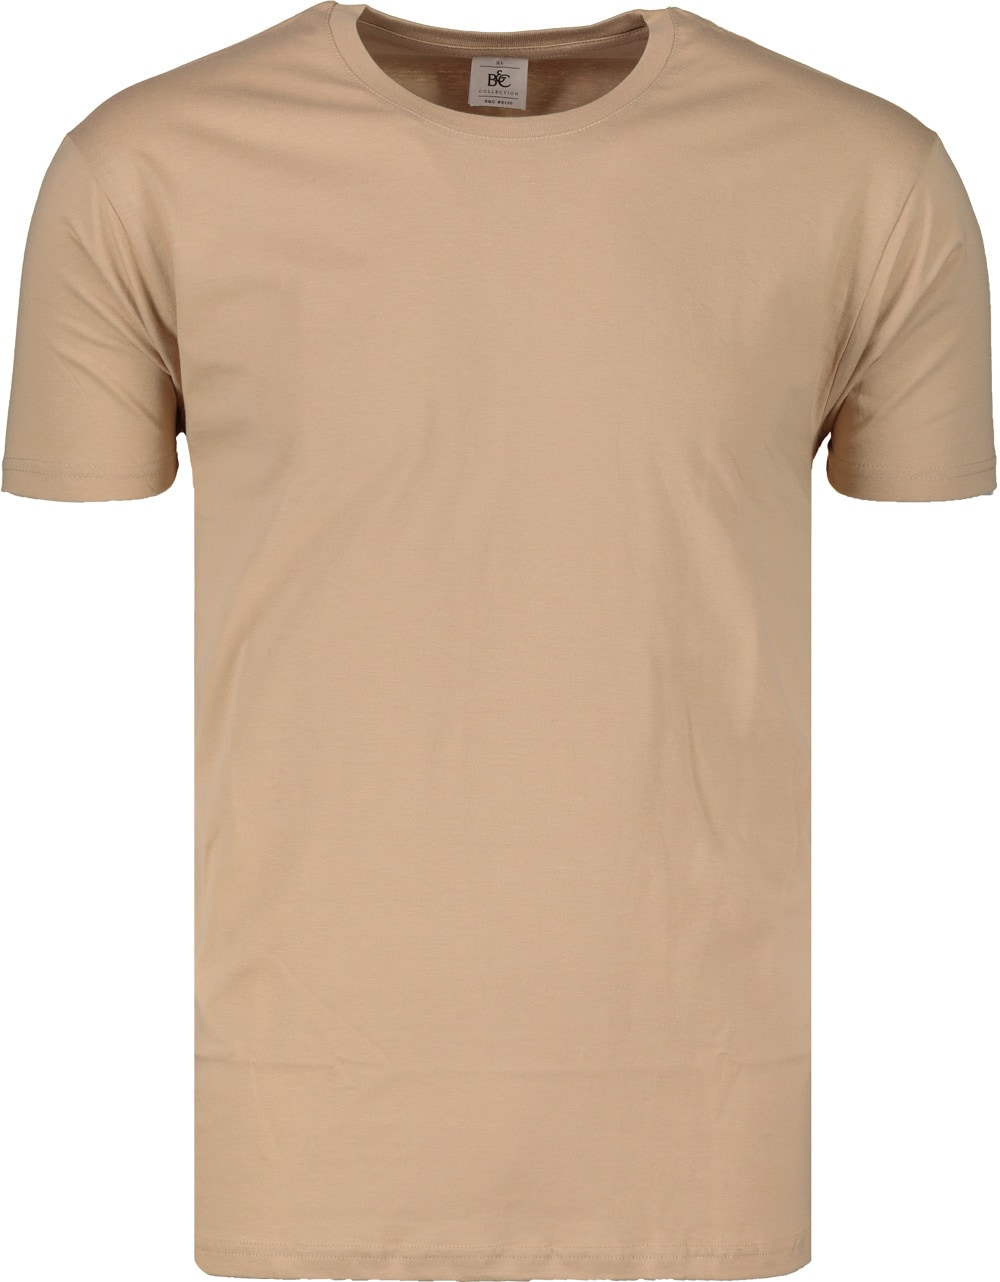 B&C Basic pánske tričko